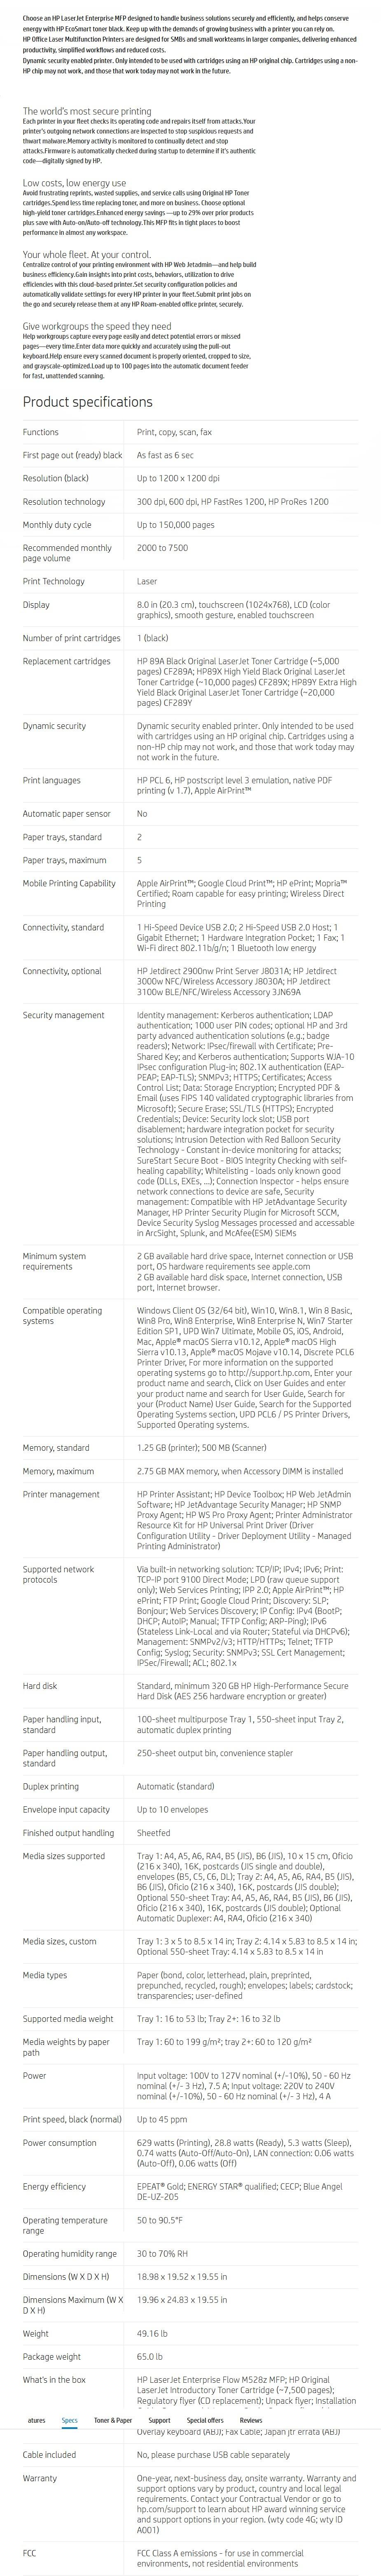 HP LaserJet Enterprise M528z Multifunction Mono Duplex Wireless Laser Printer - Desktop Overview 1